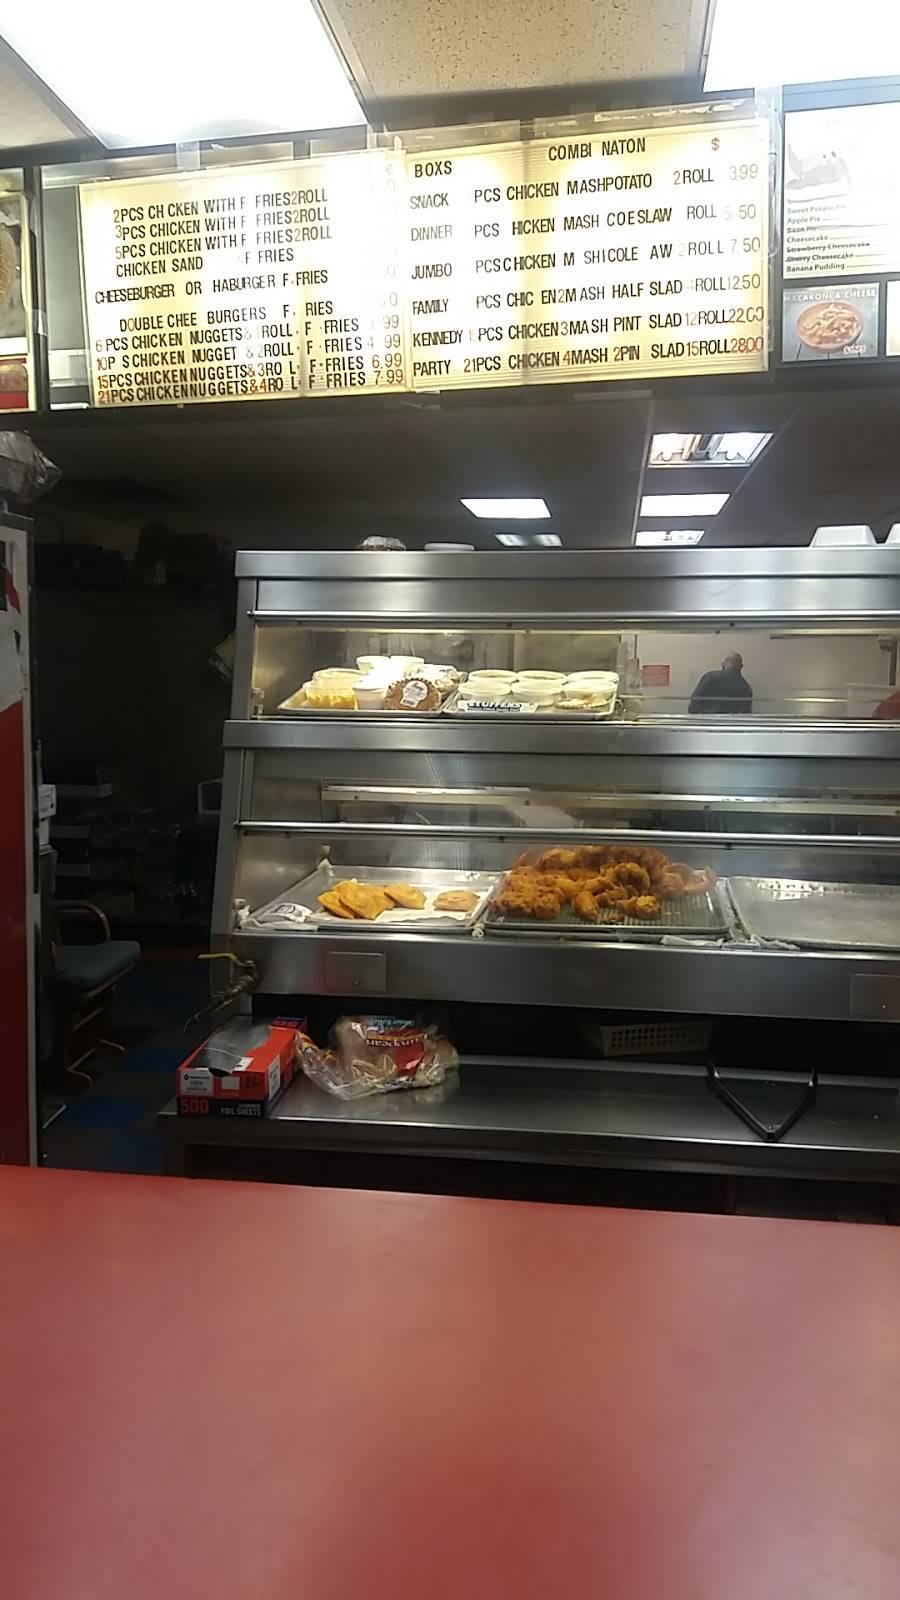 Kennedys Fried Chicken | restaurant | 392 Main St, Beacon, NY 12508, USA | 8458318411 OR +1 845-831-8411